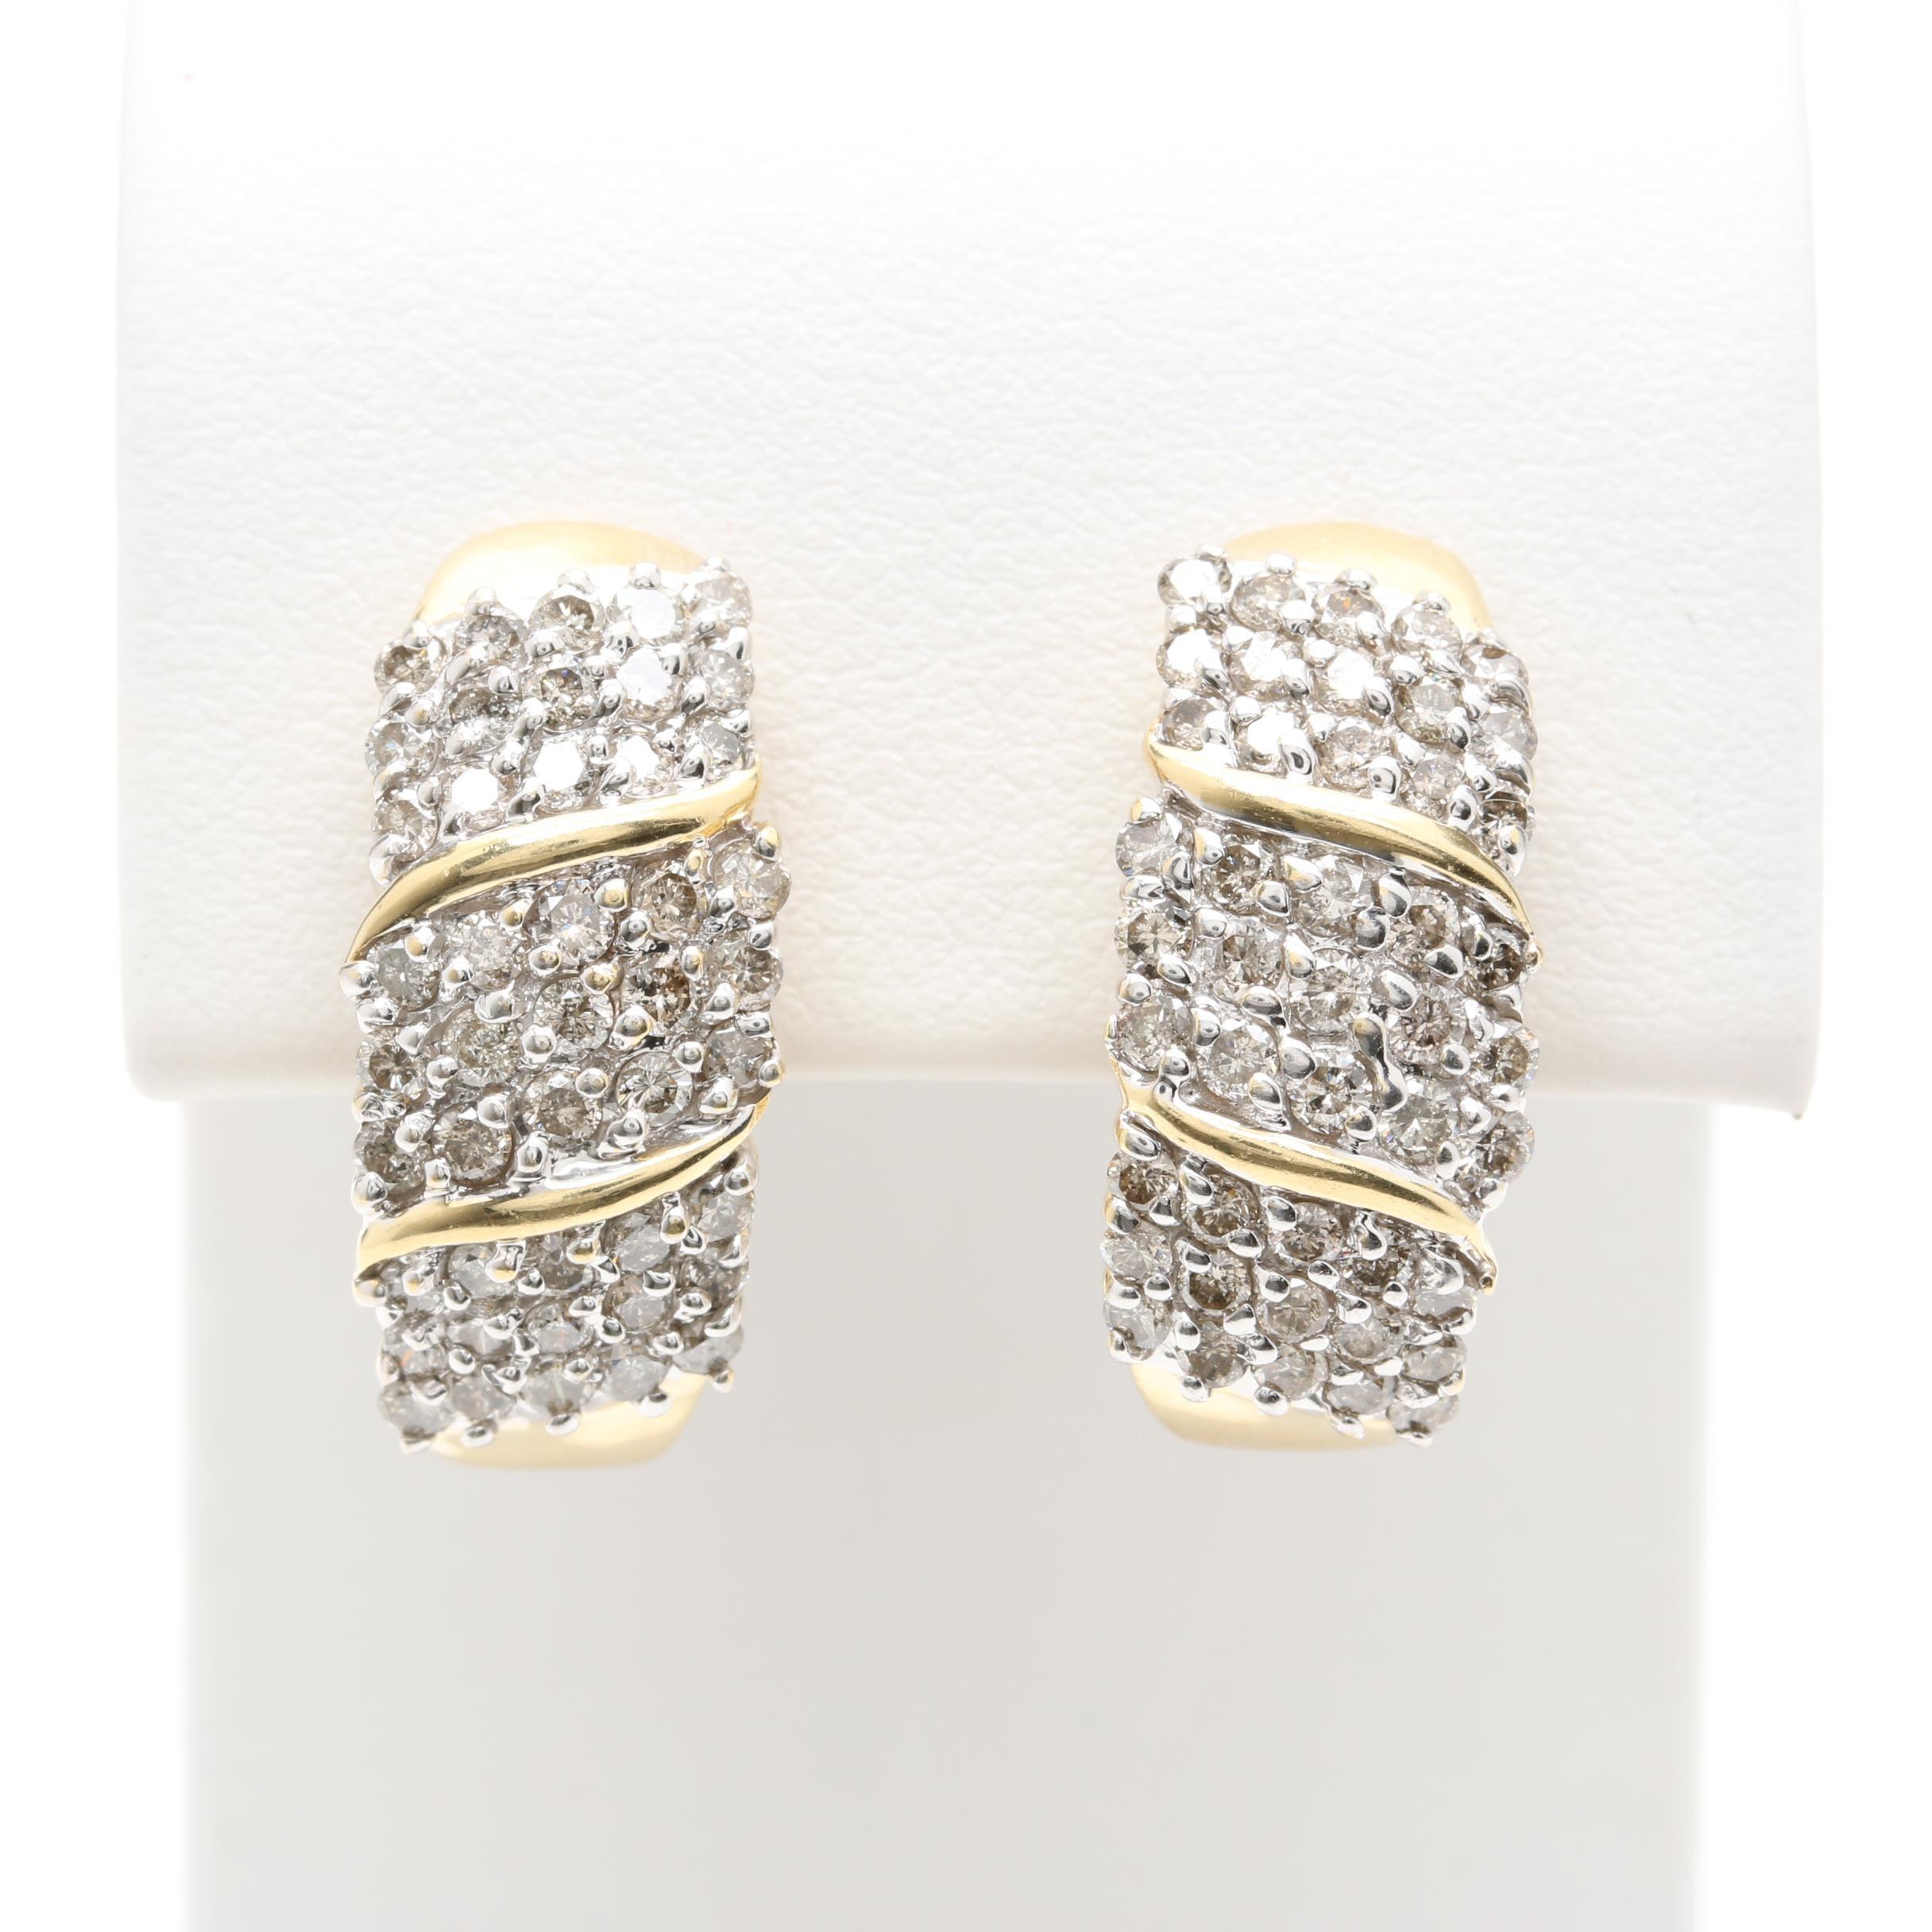 14K Yellow Gold 2.25 CTW Diamond Clip On Earrings